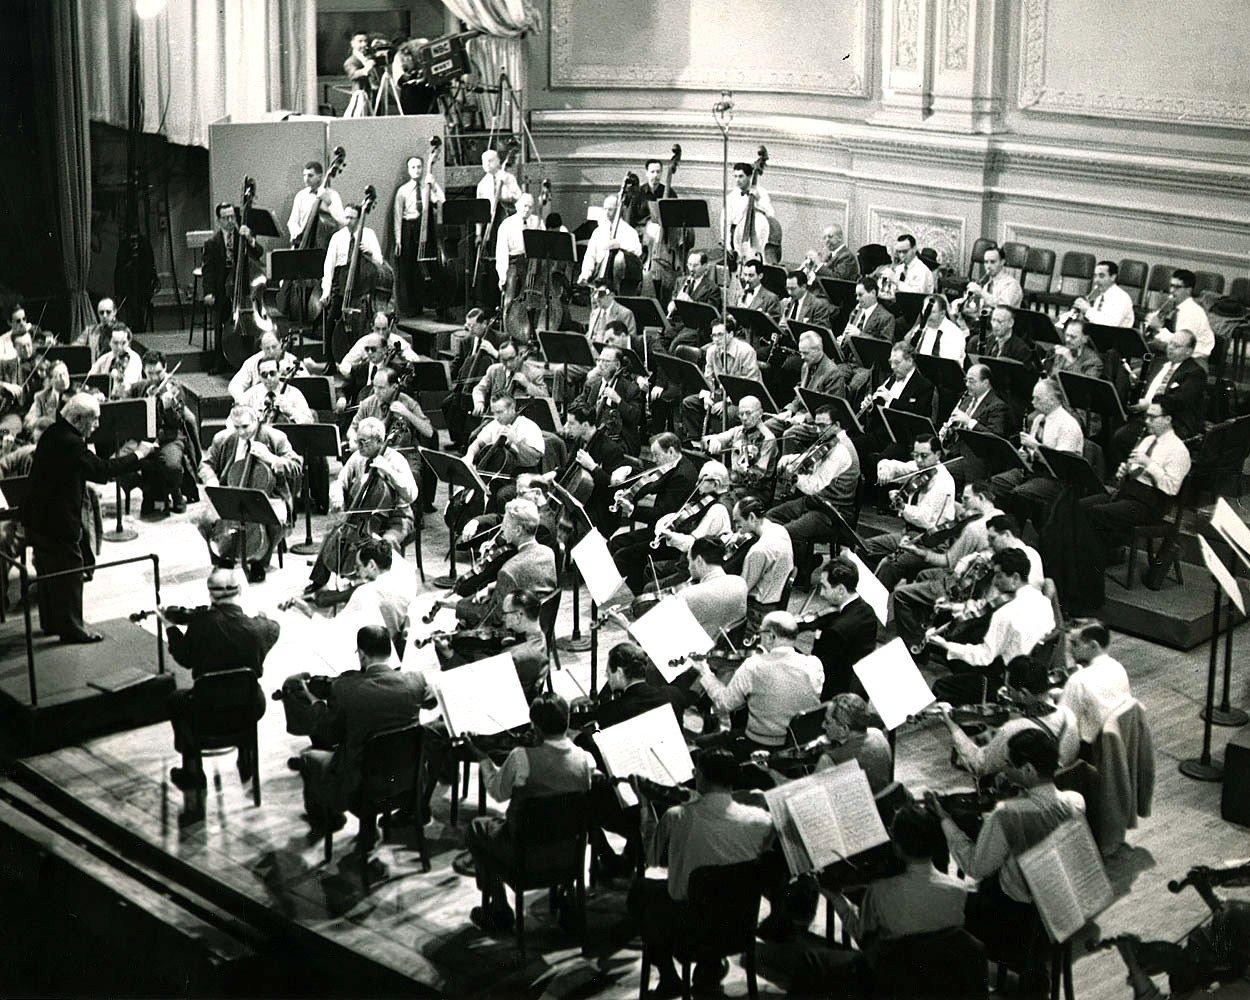 NBC RADIO SYMPHONY ORCHESTRA @ CARNEGIE HALL CIRCA 1954 - 8X10 PHOTO (EP-663)